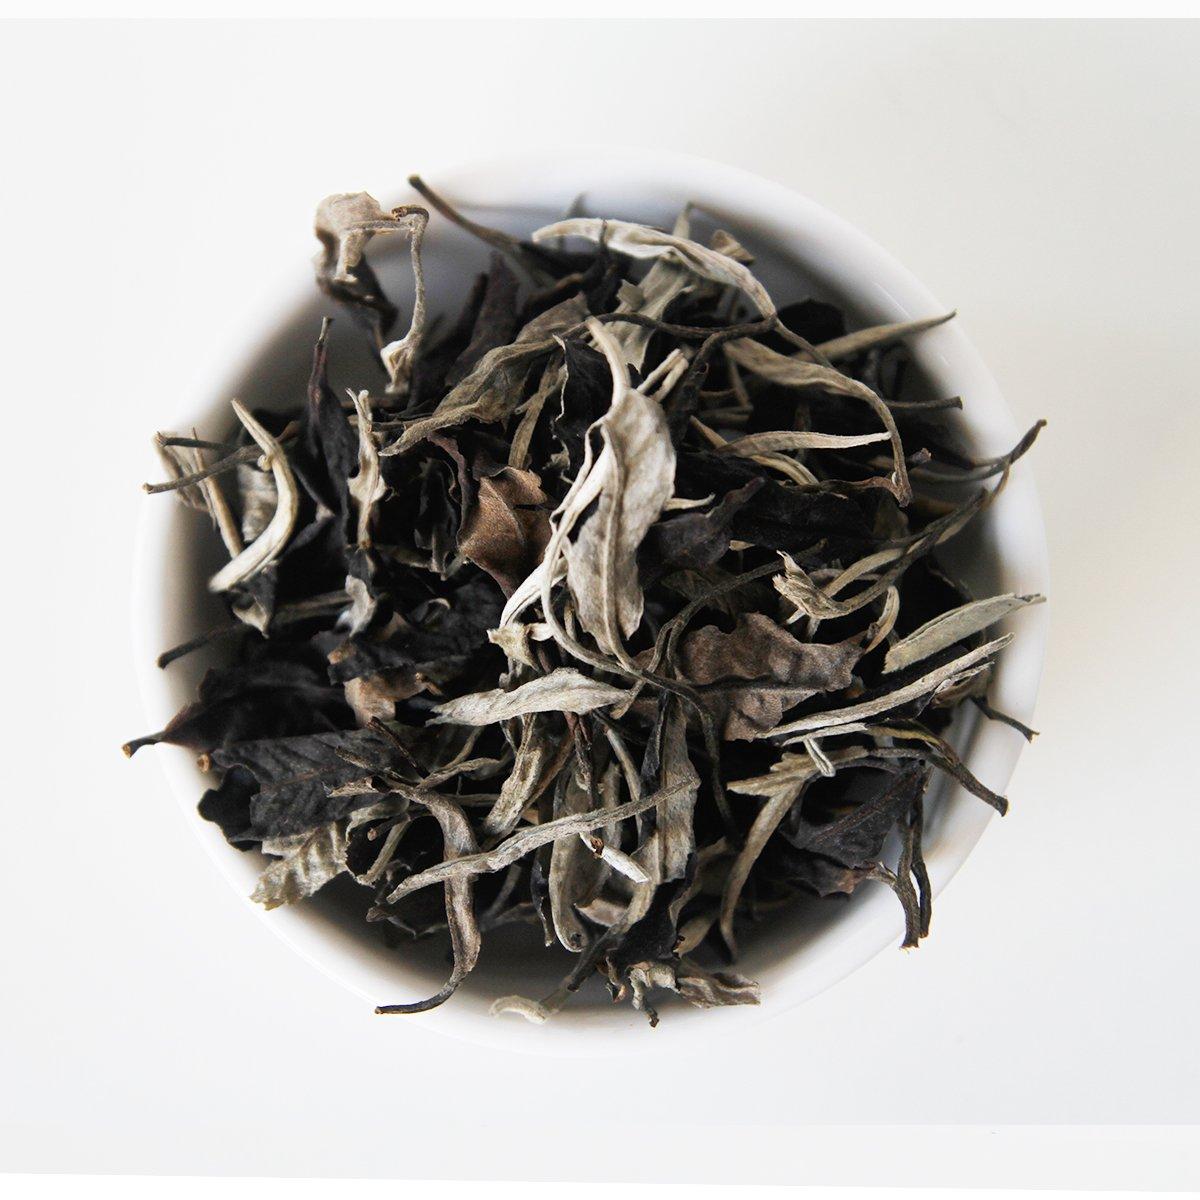 Shan Tuyết Bạch Trà Mây Cao Cấp 35g - White Tea